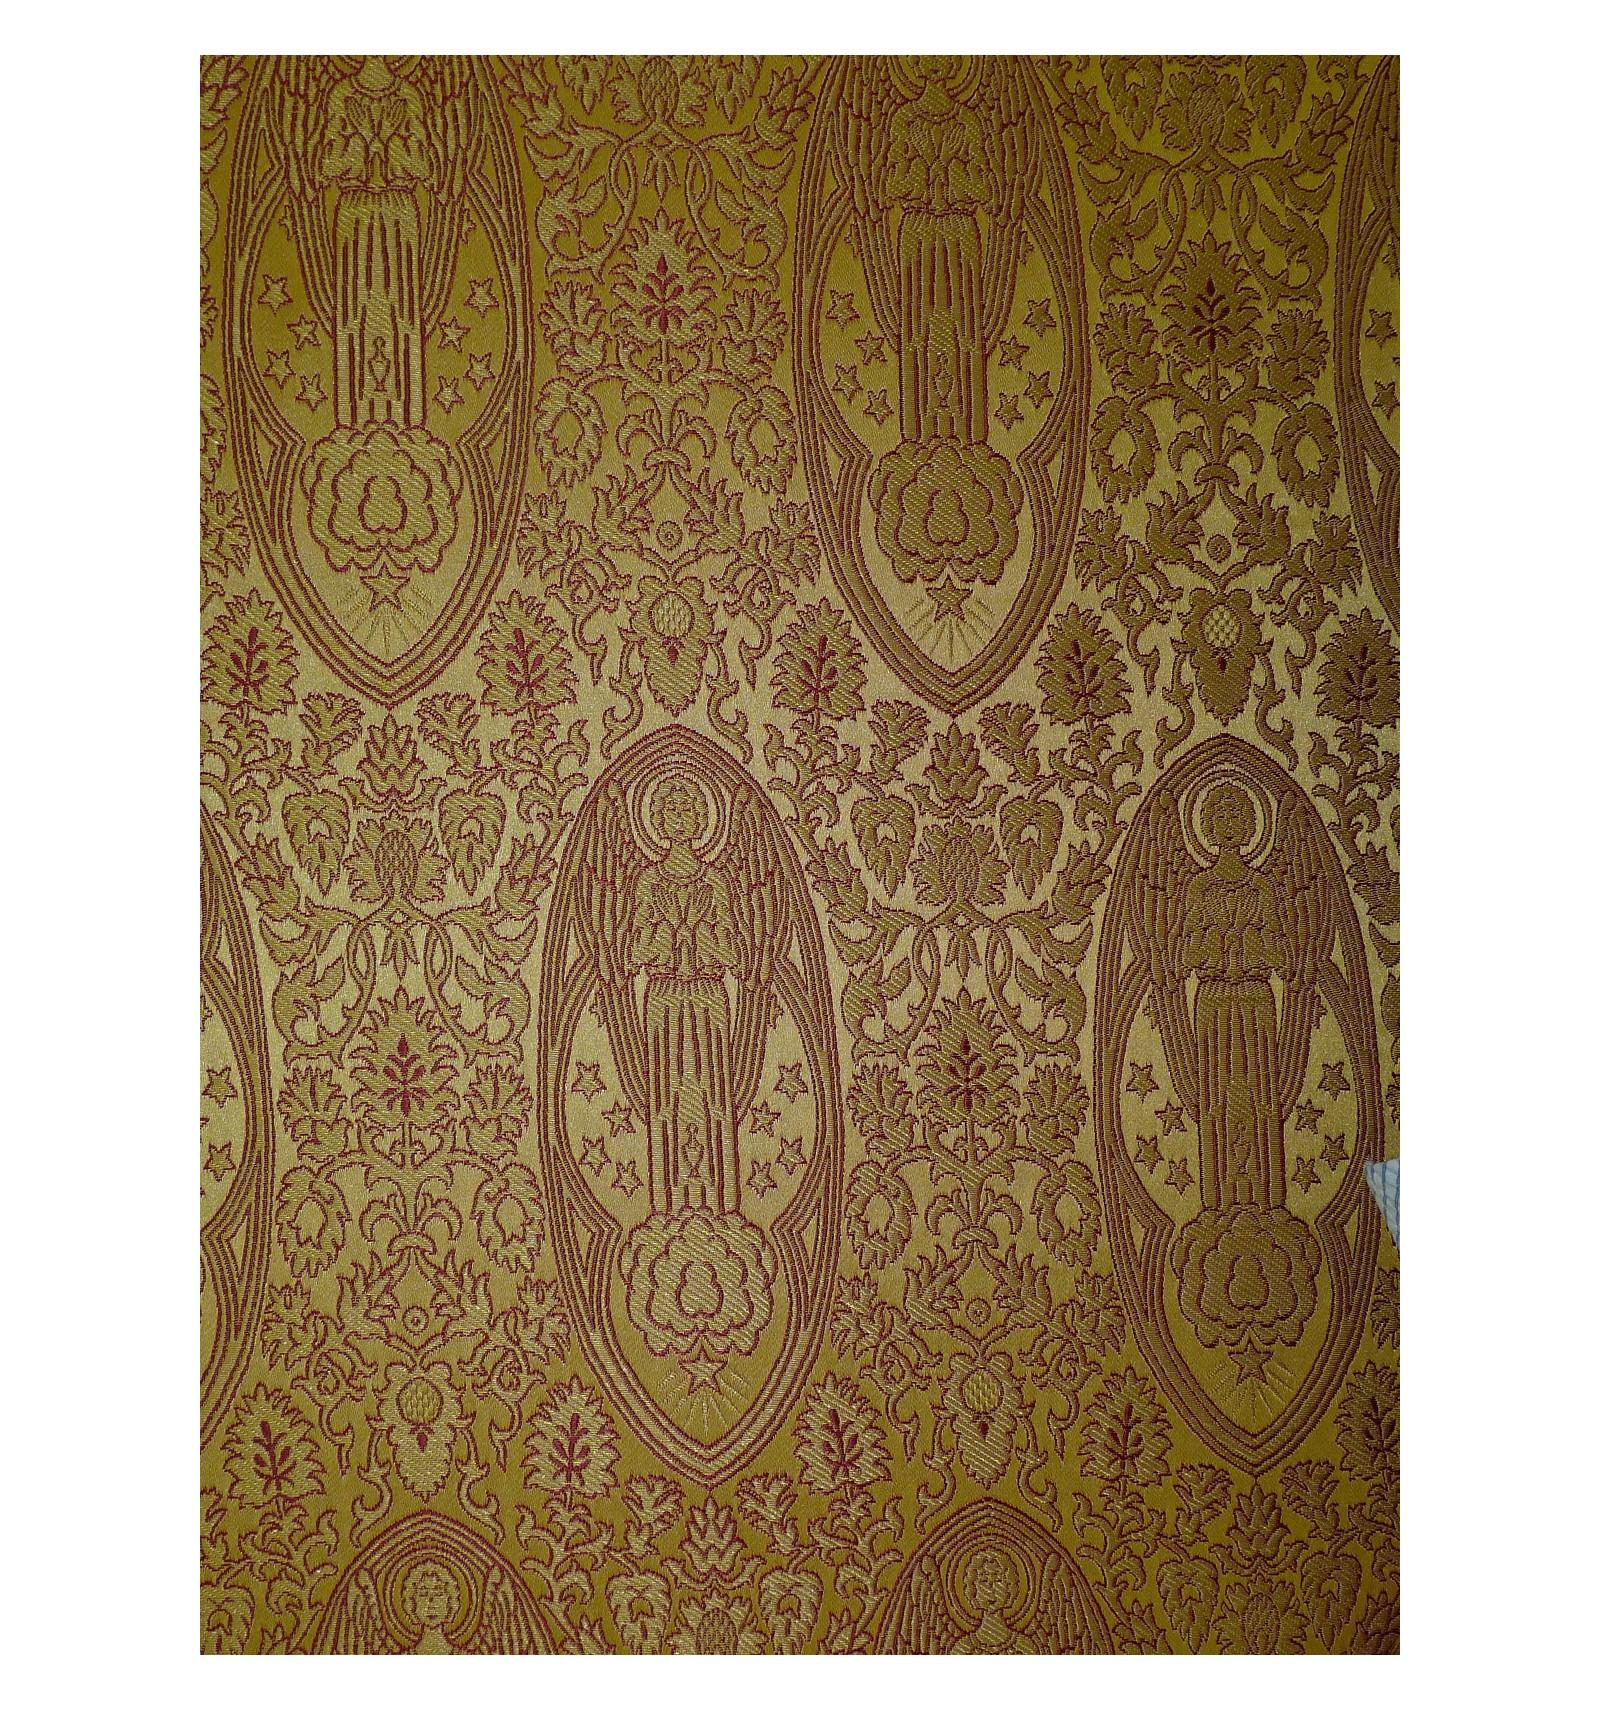 tissu damass baldam960 inter nos chasuble. Black Bedroom Furniture Sets. Home Design Ideas